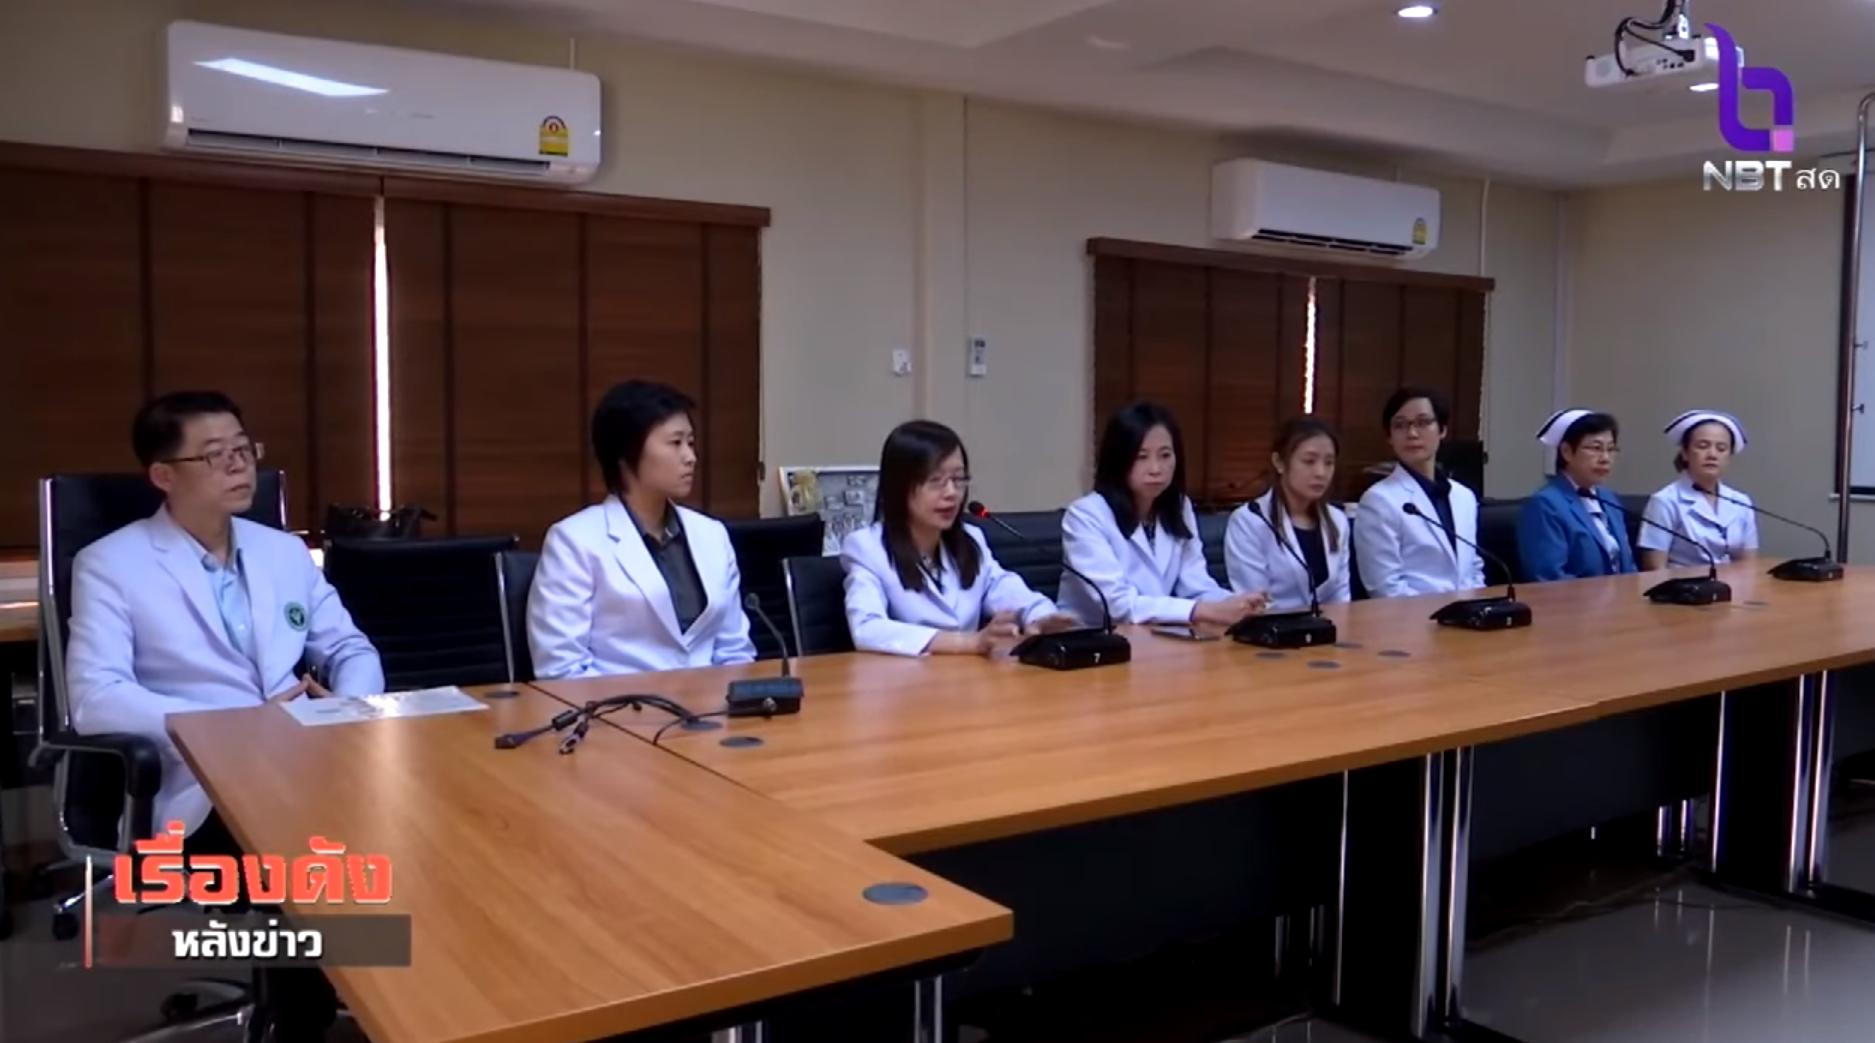 thai doctors